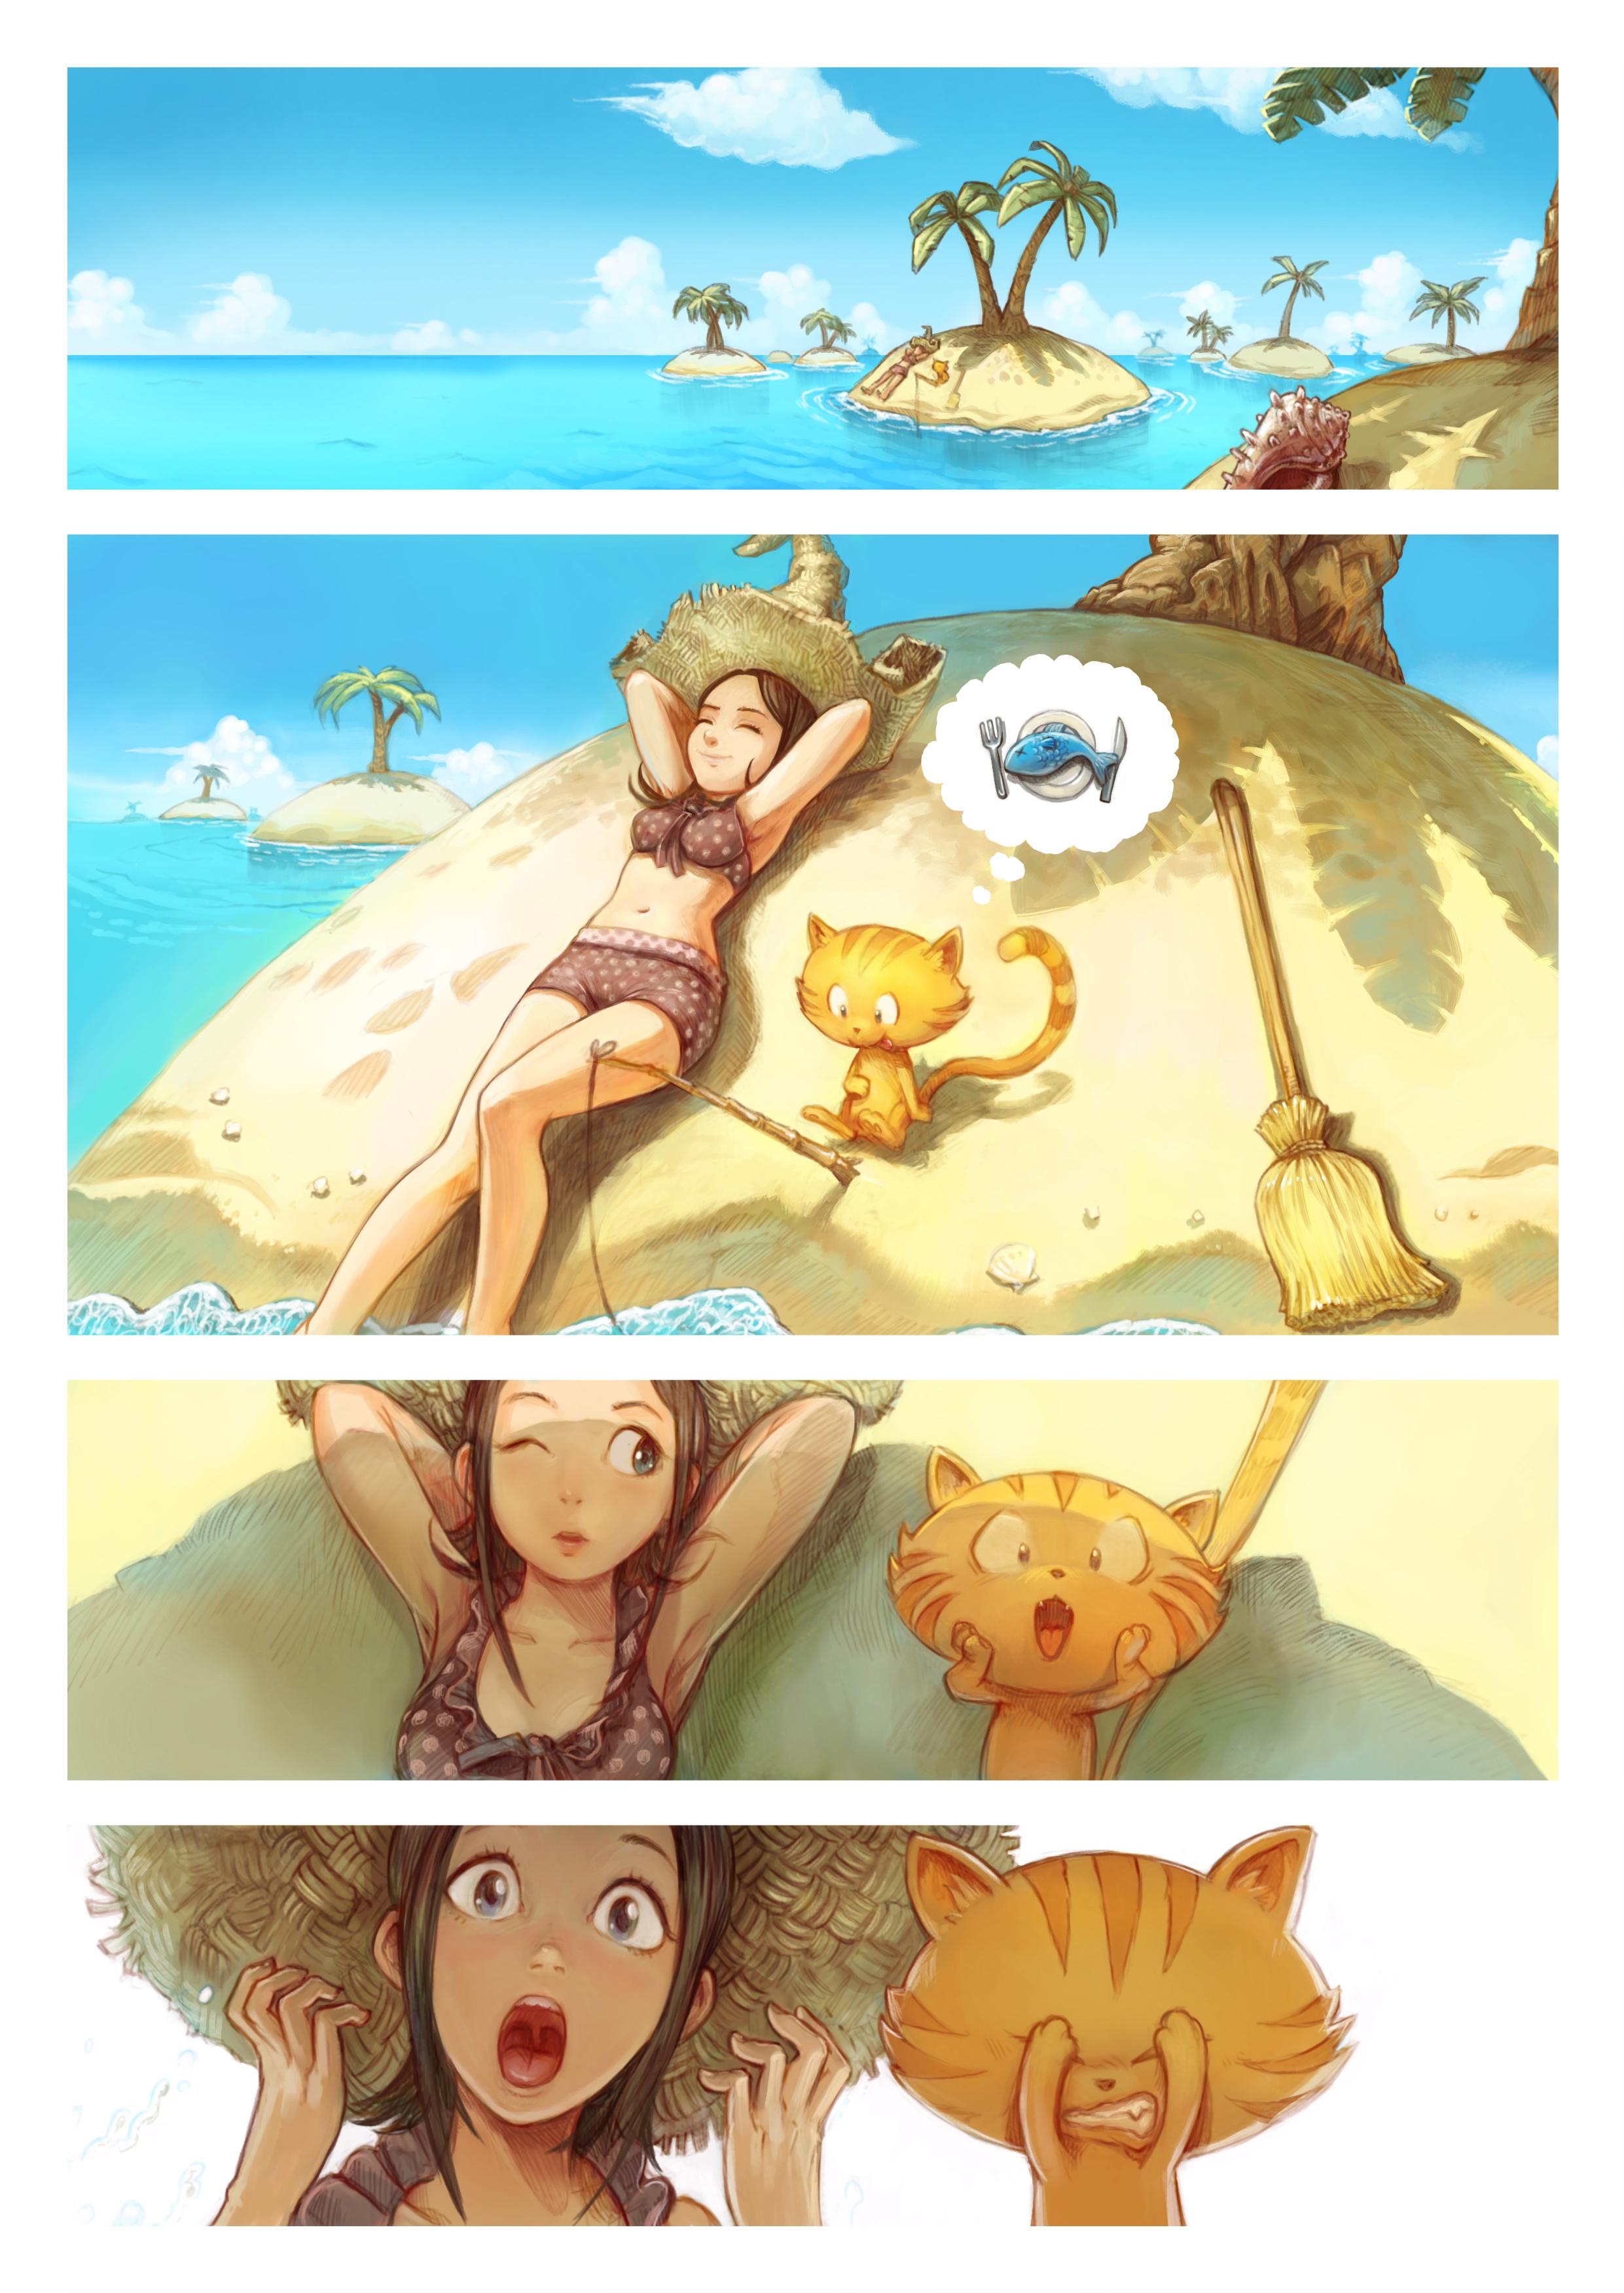 第10集:夏日特辑, Page 1